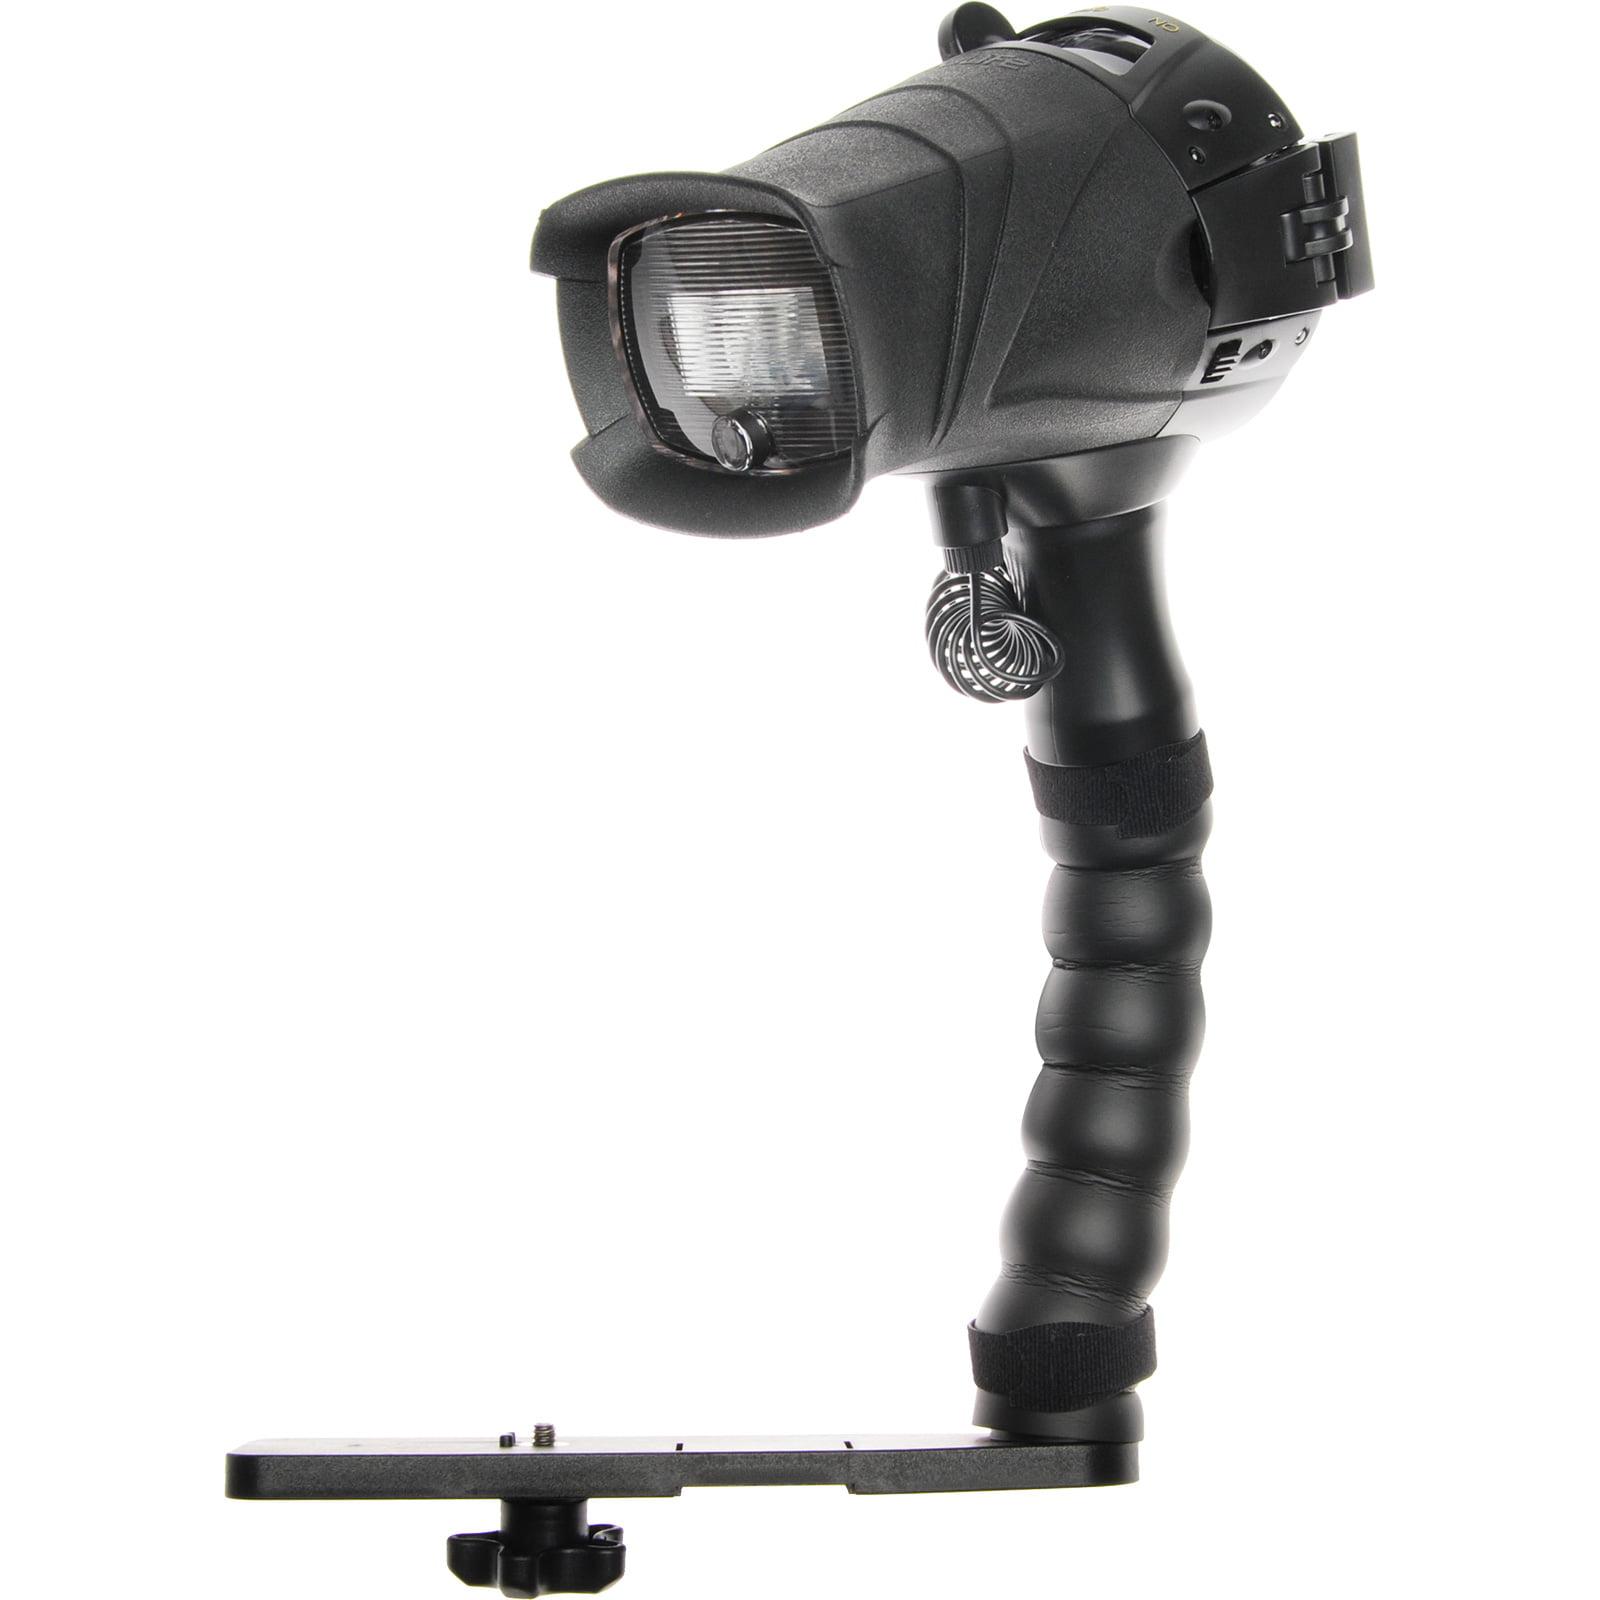 Sealife SL961 Universal Underwater Photo/Video Pro Flash ...